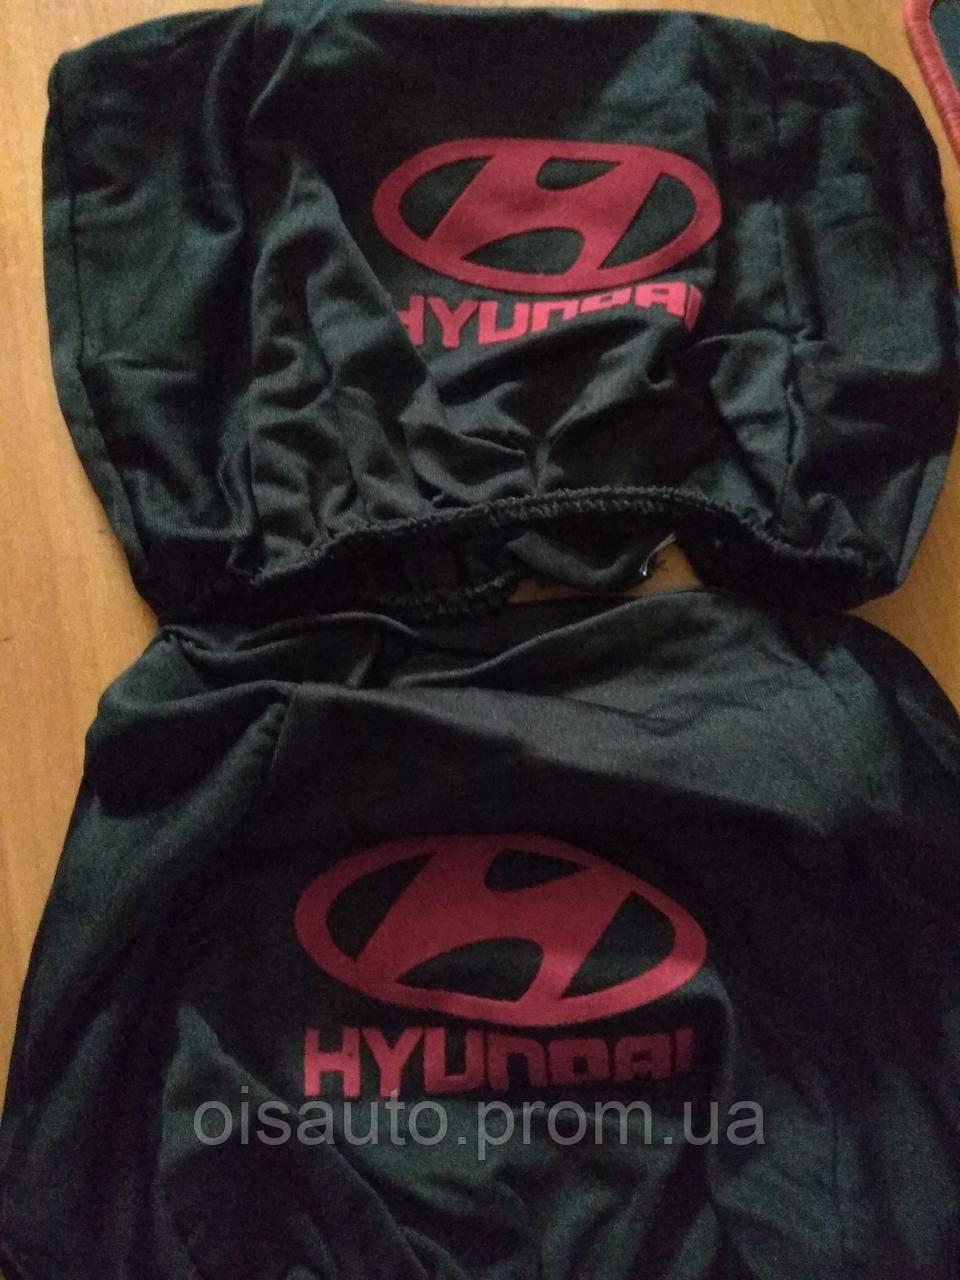 Чохол на підголовник HYUNDAI (к-кт 2шт) (чорний) COVERS